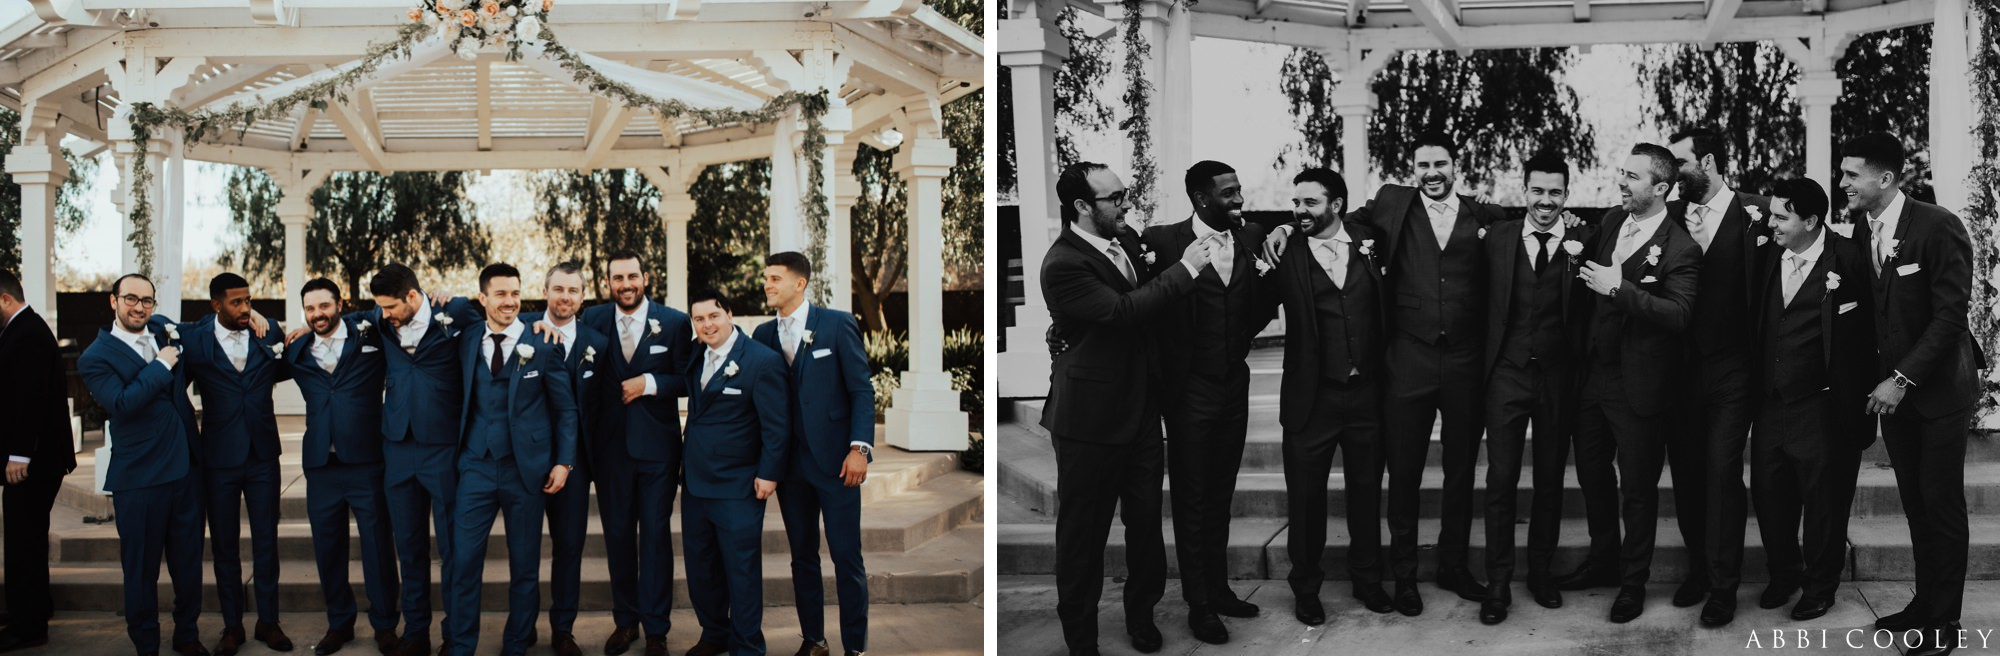 ABBI COOLEY WILSON CREEK WINERY TEMECULA WEDDING_0861